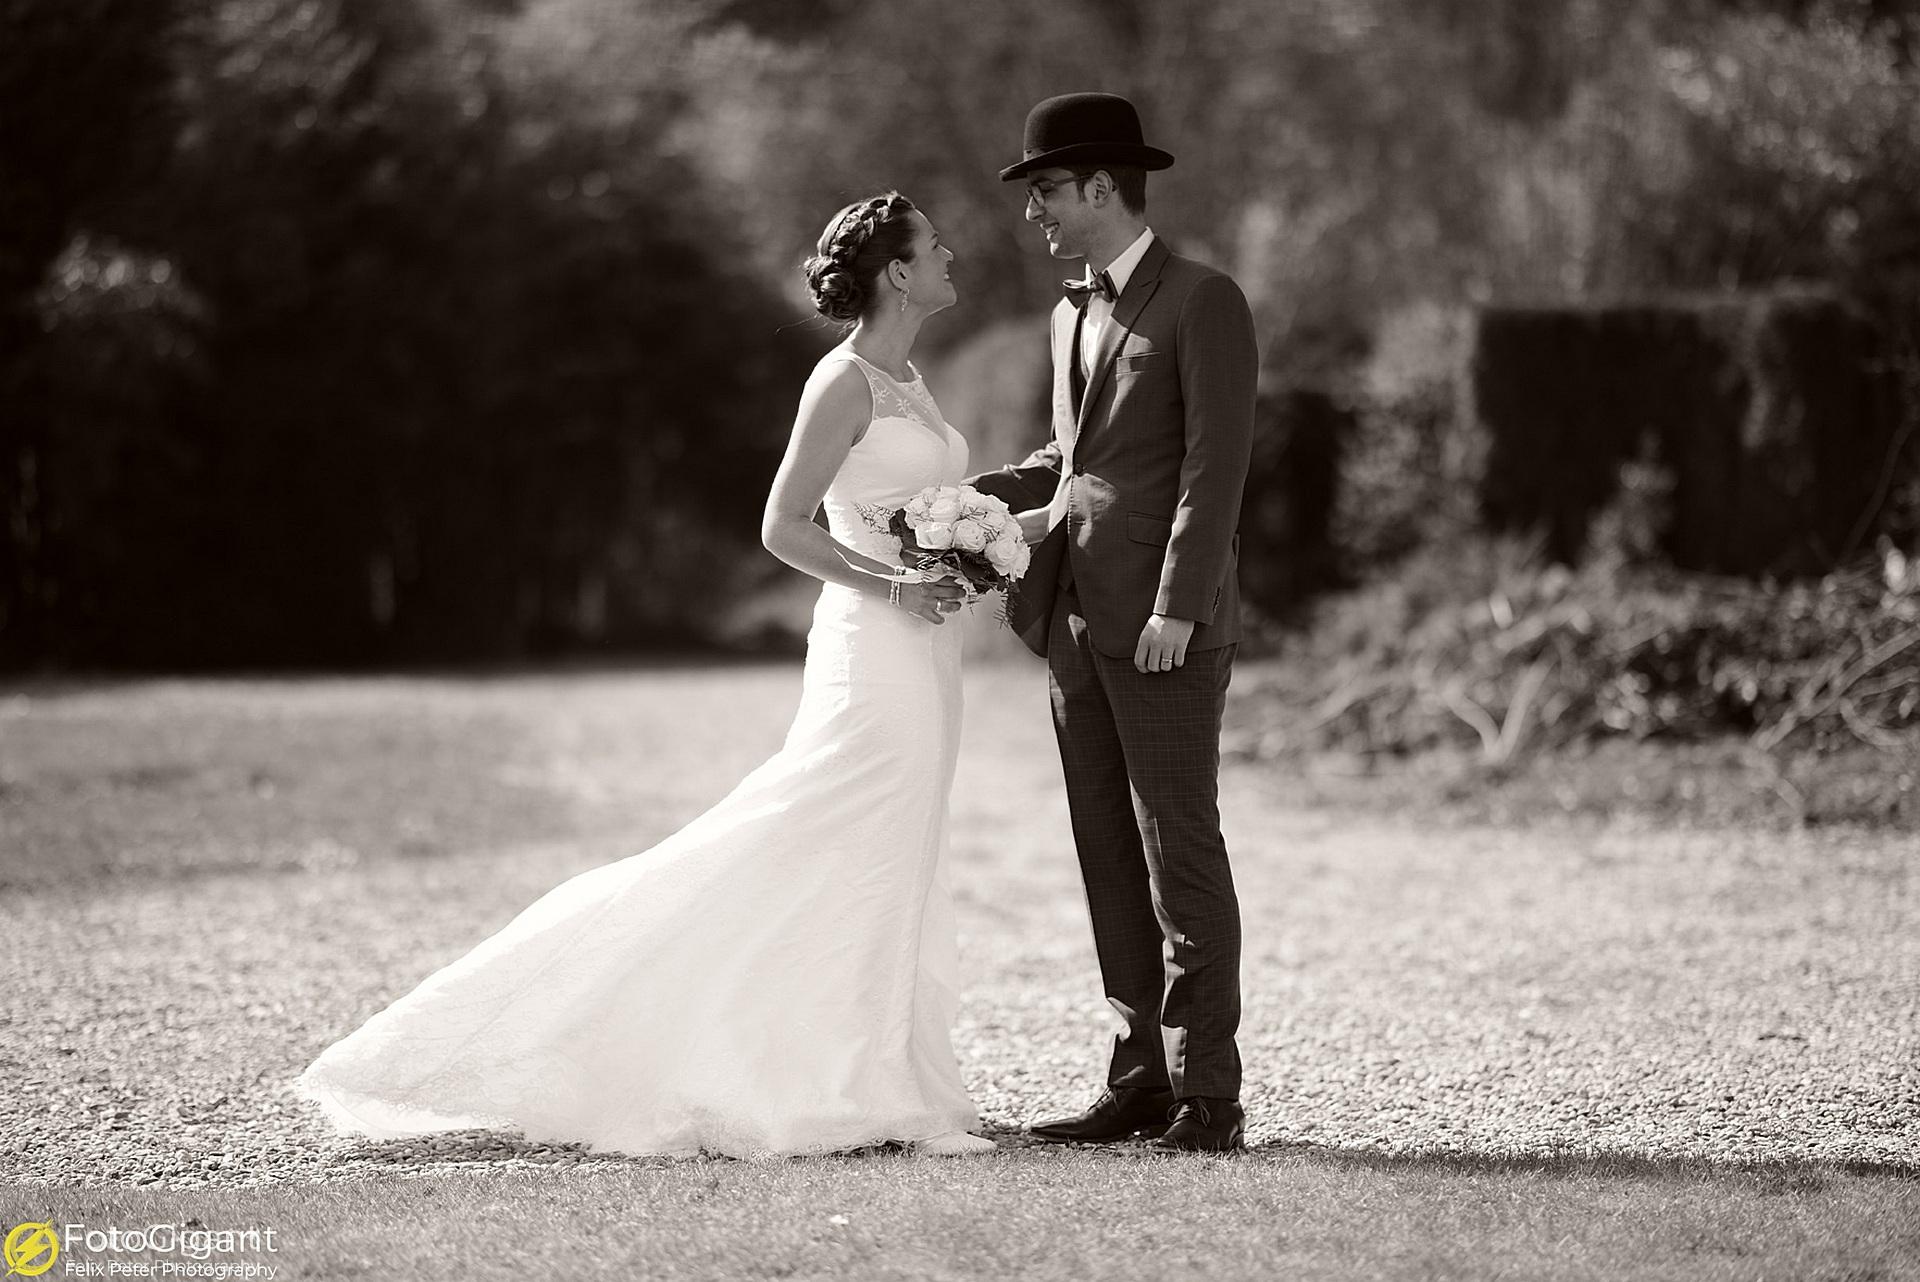 Hochzeitsfotografiekurs_Fotograf_Felix_Peter_16.jpg